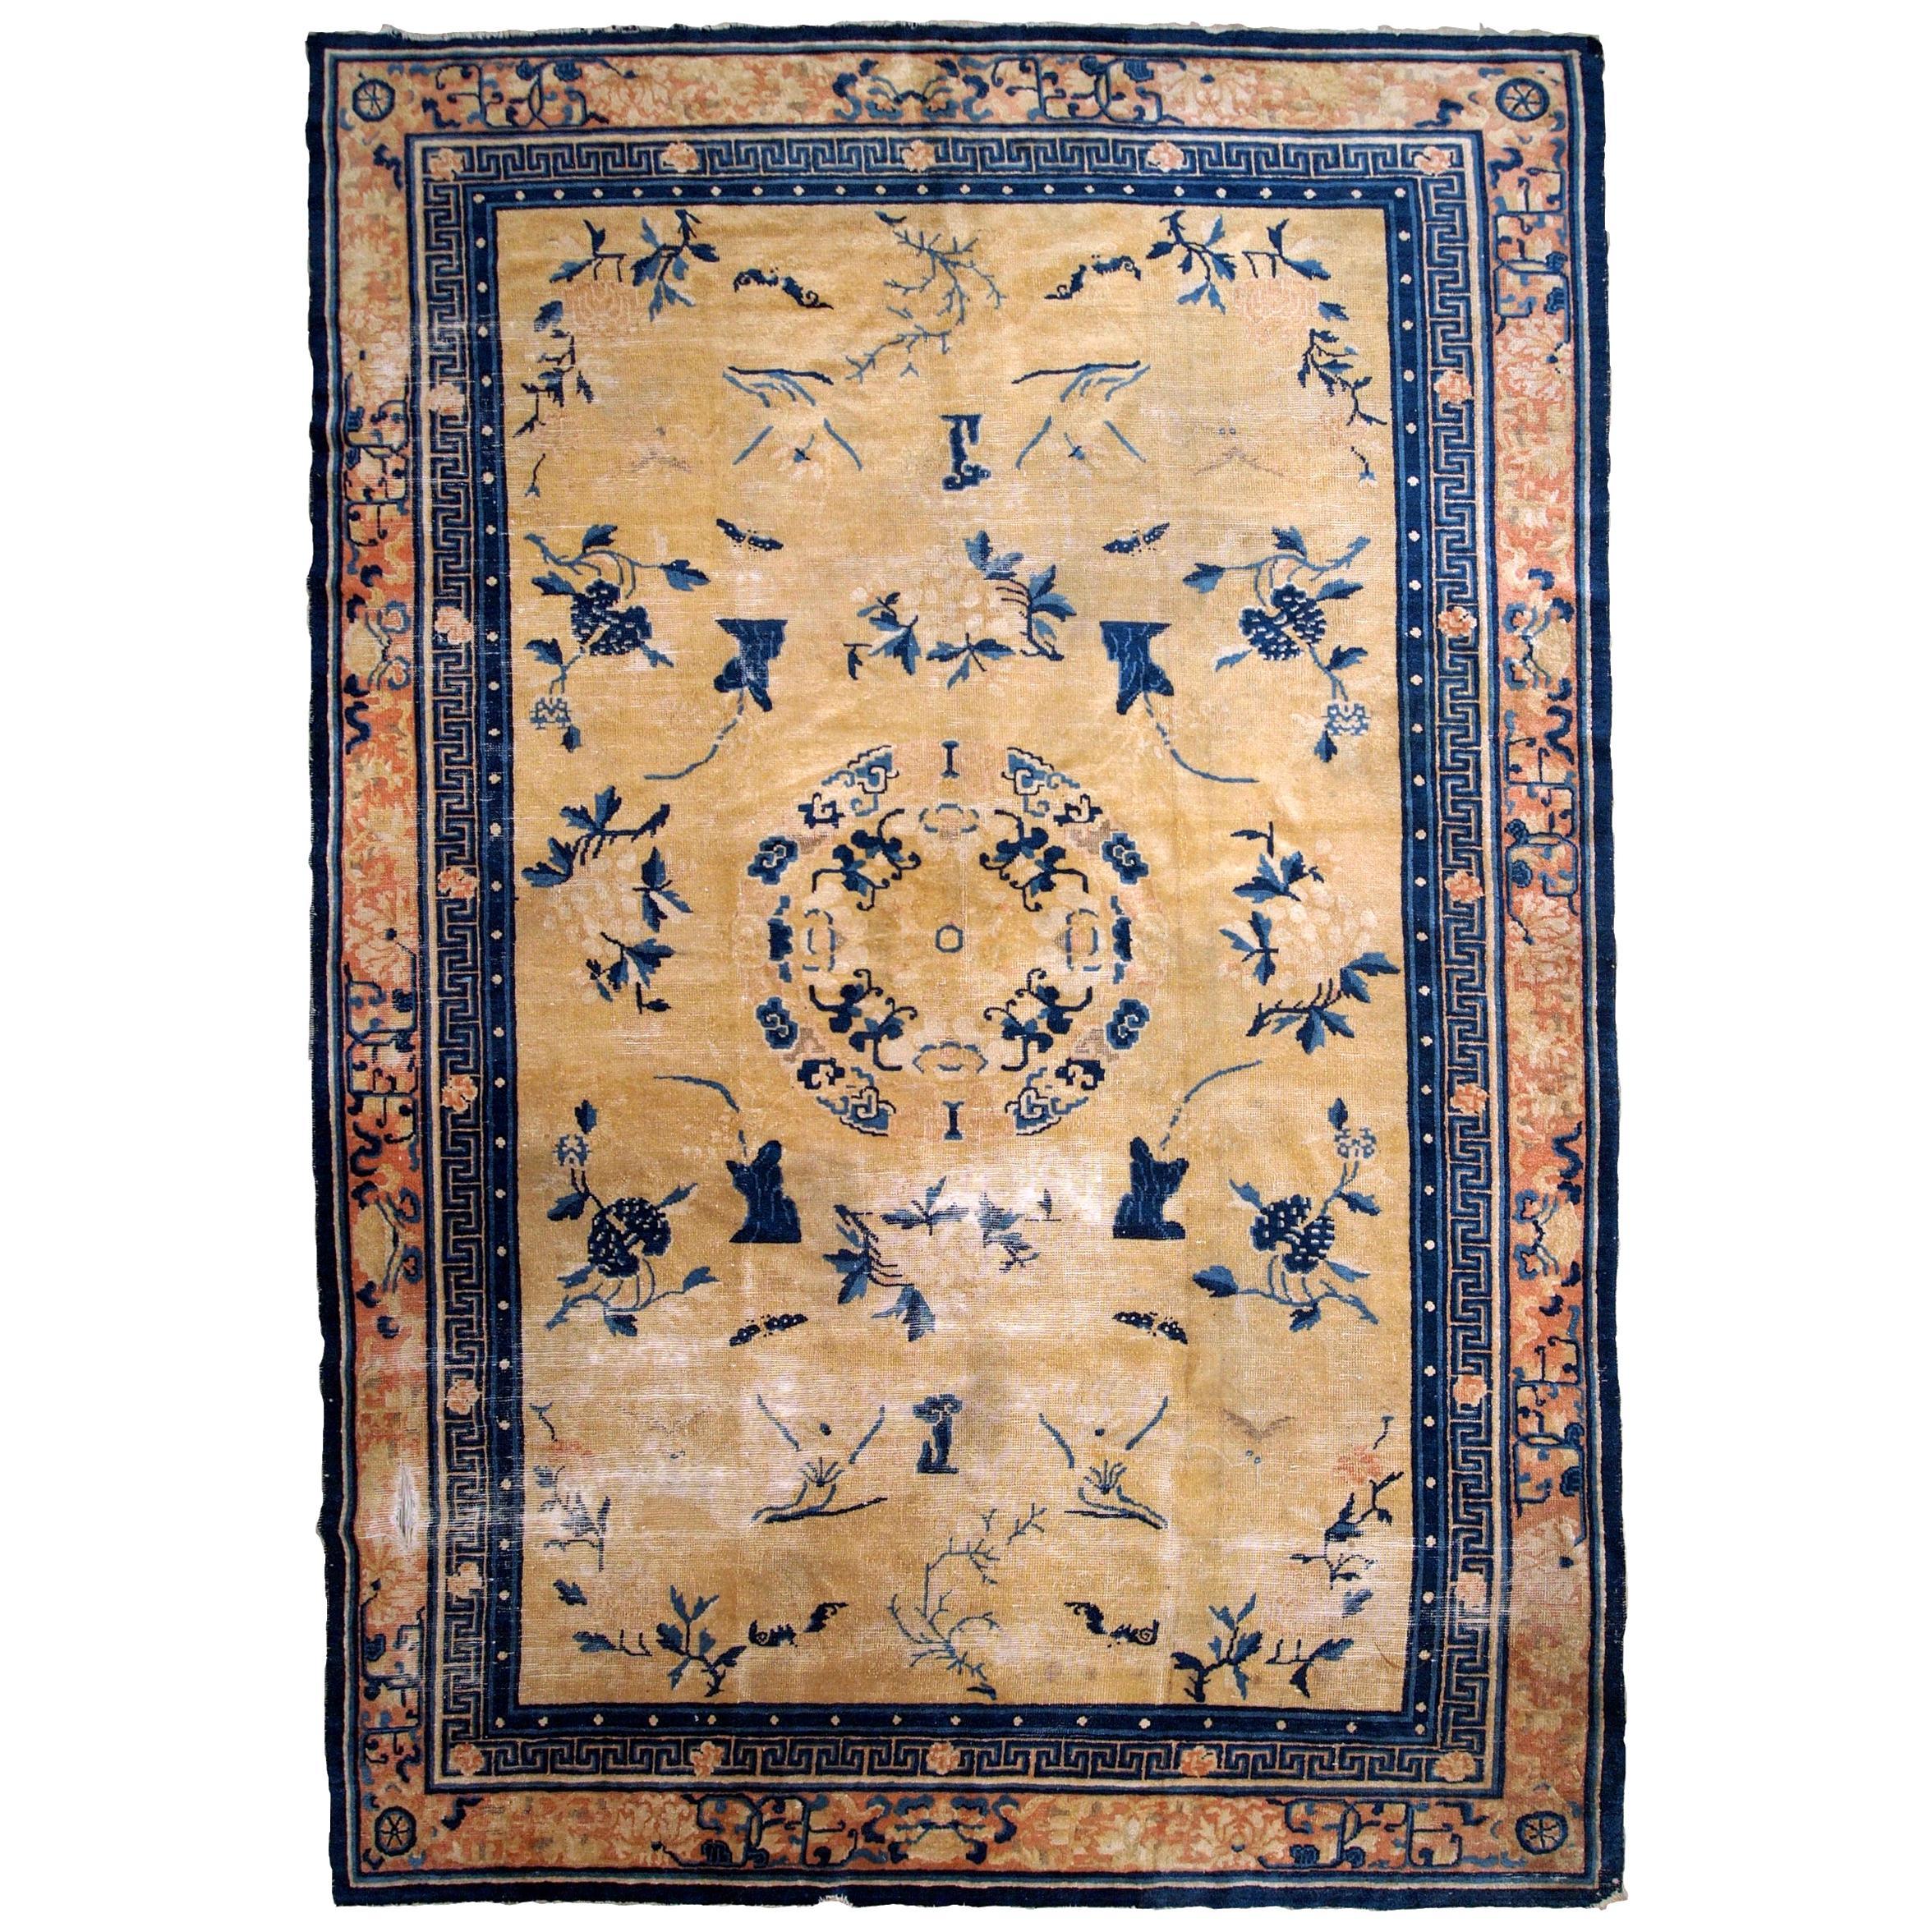 Handmade Antique Chinese Ningsha Rug, 1870s, 1B799